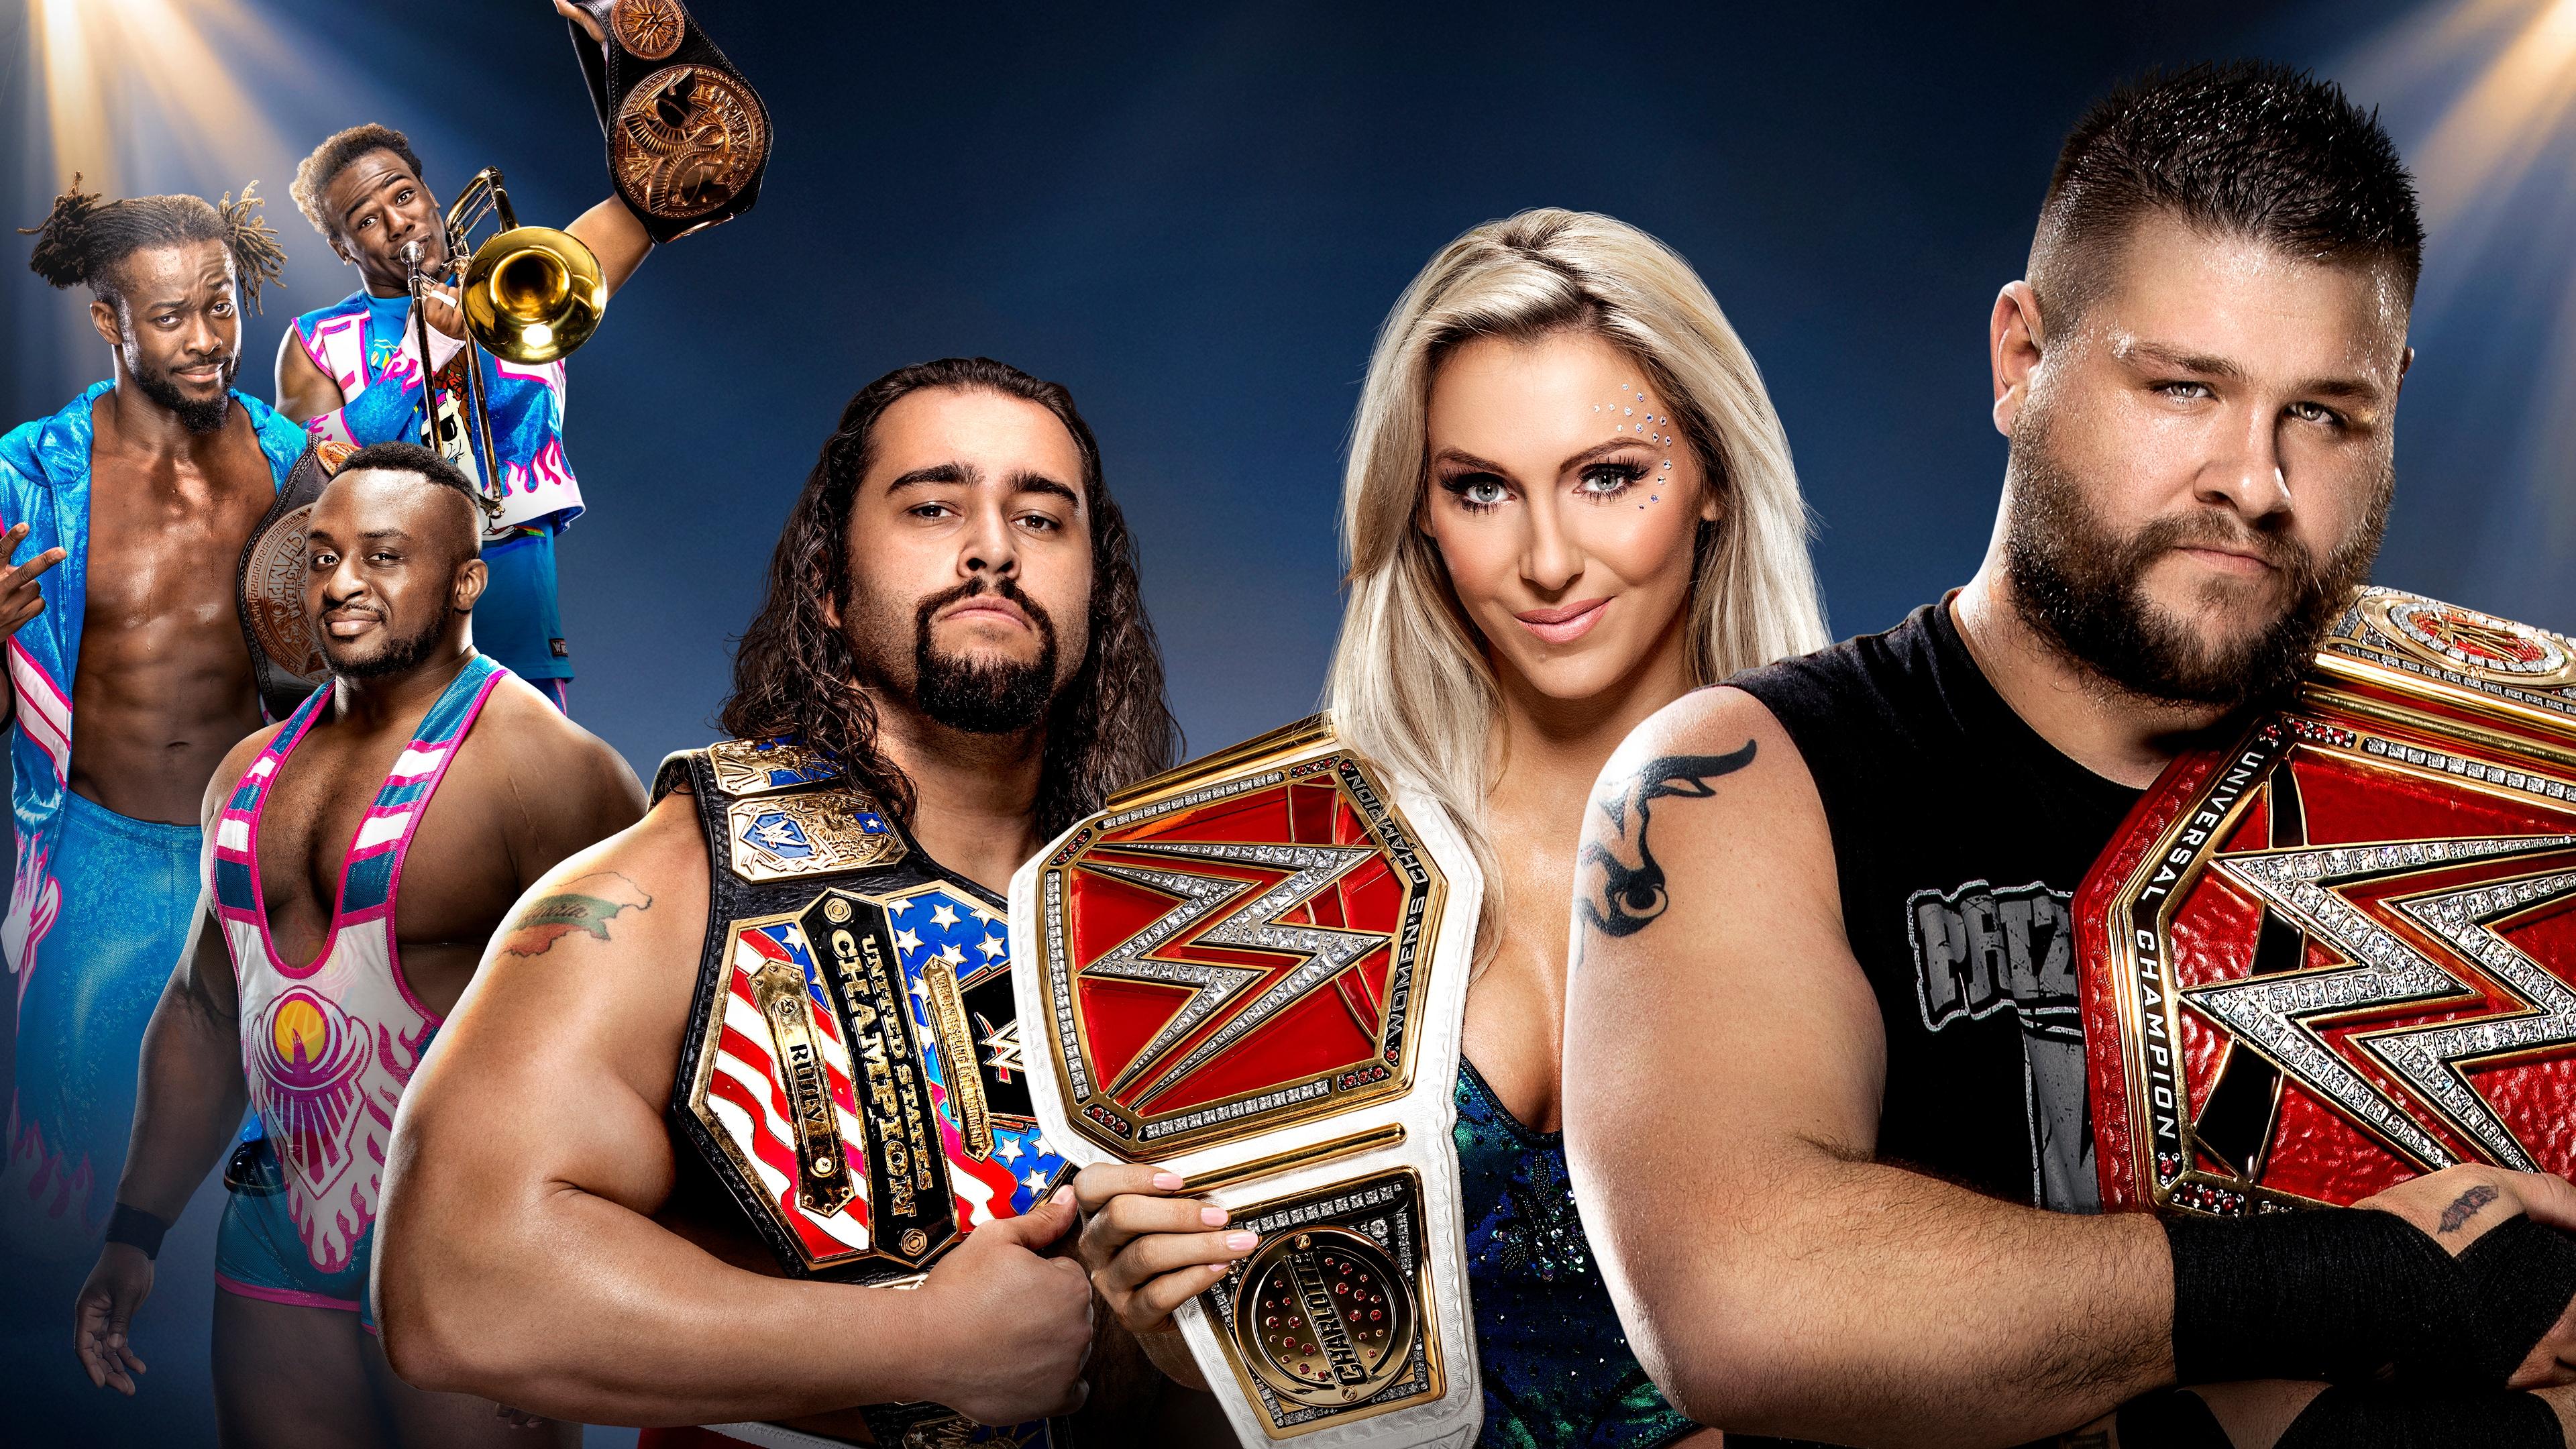 Clash of Champions 2016